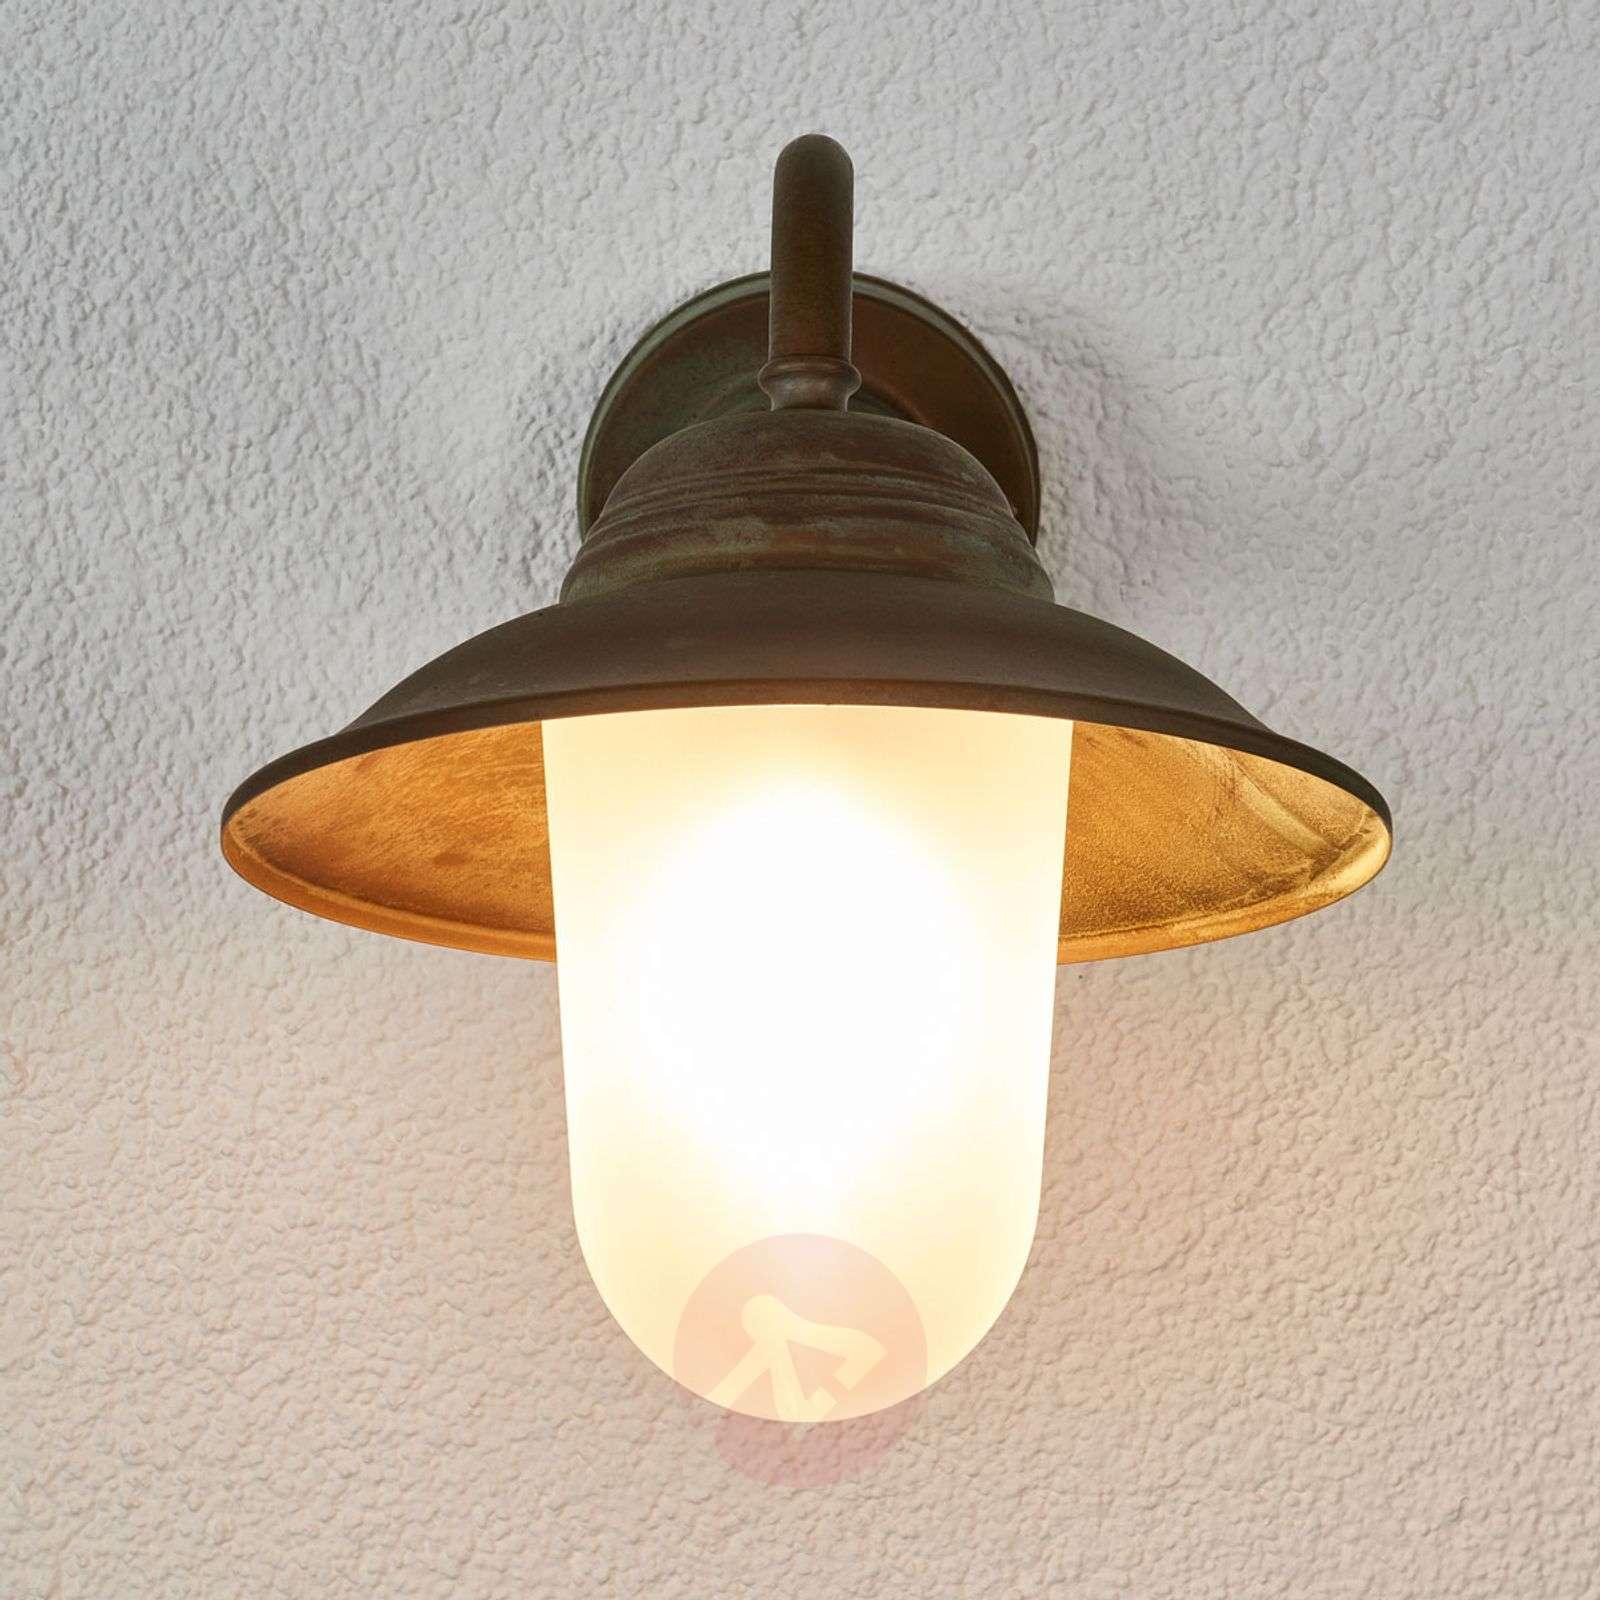 Curved outdoor wall light Birga-6515248-01